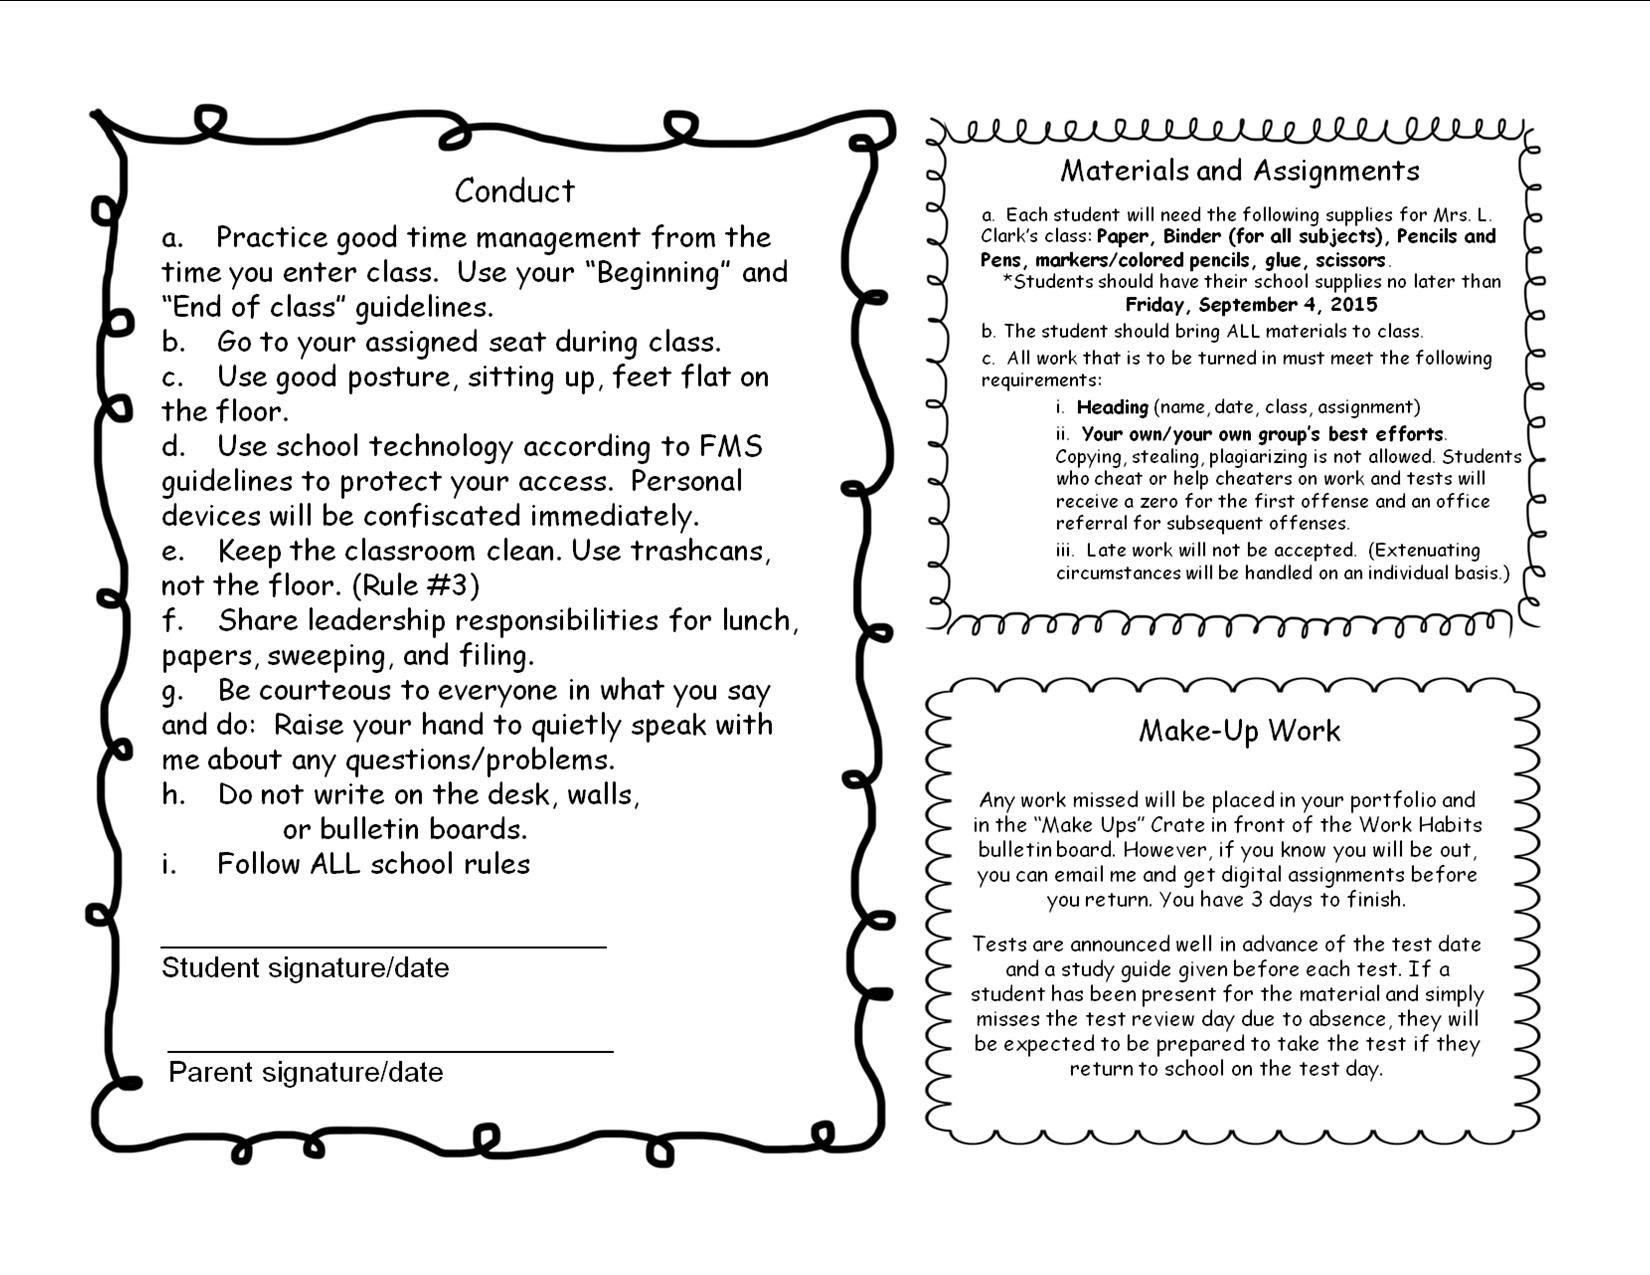 hight resolution of Syllabus Social Studies - Mrs. L. Clark's 7th Grade FMS